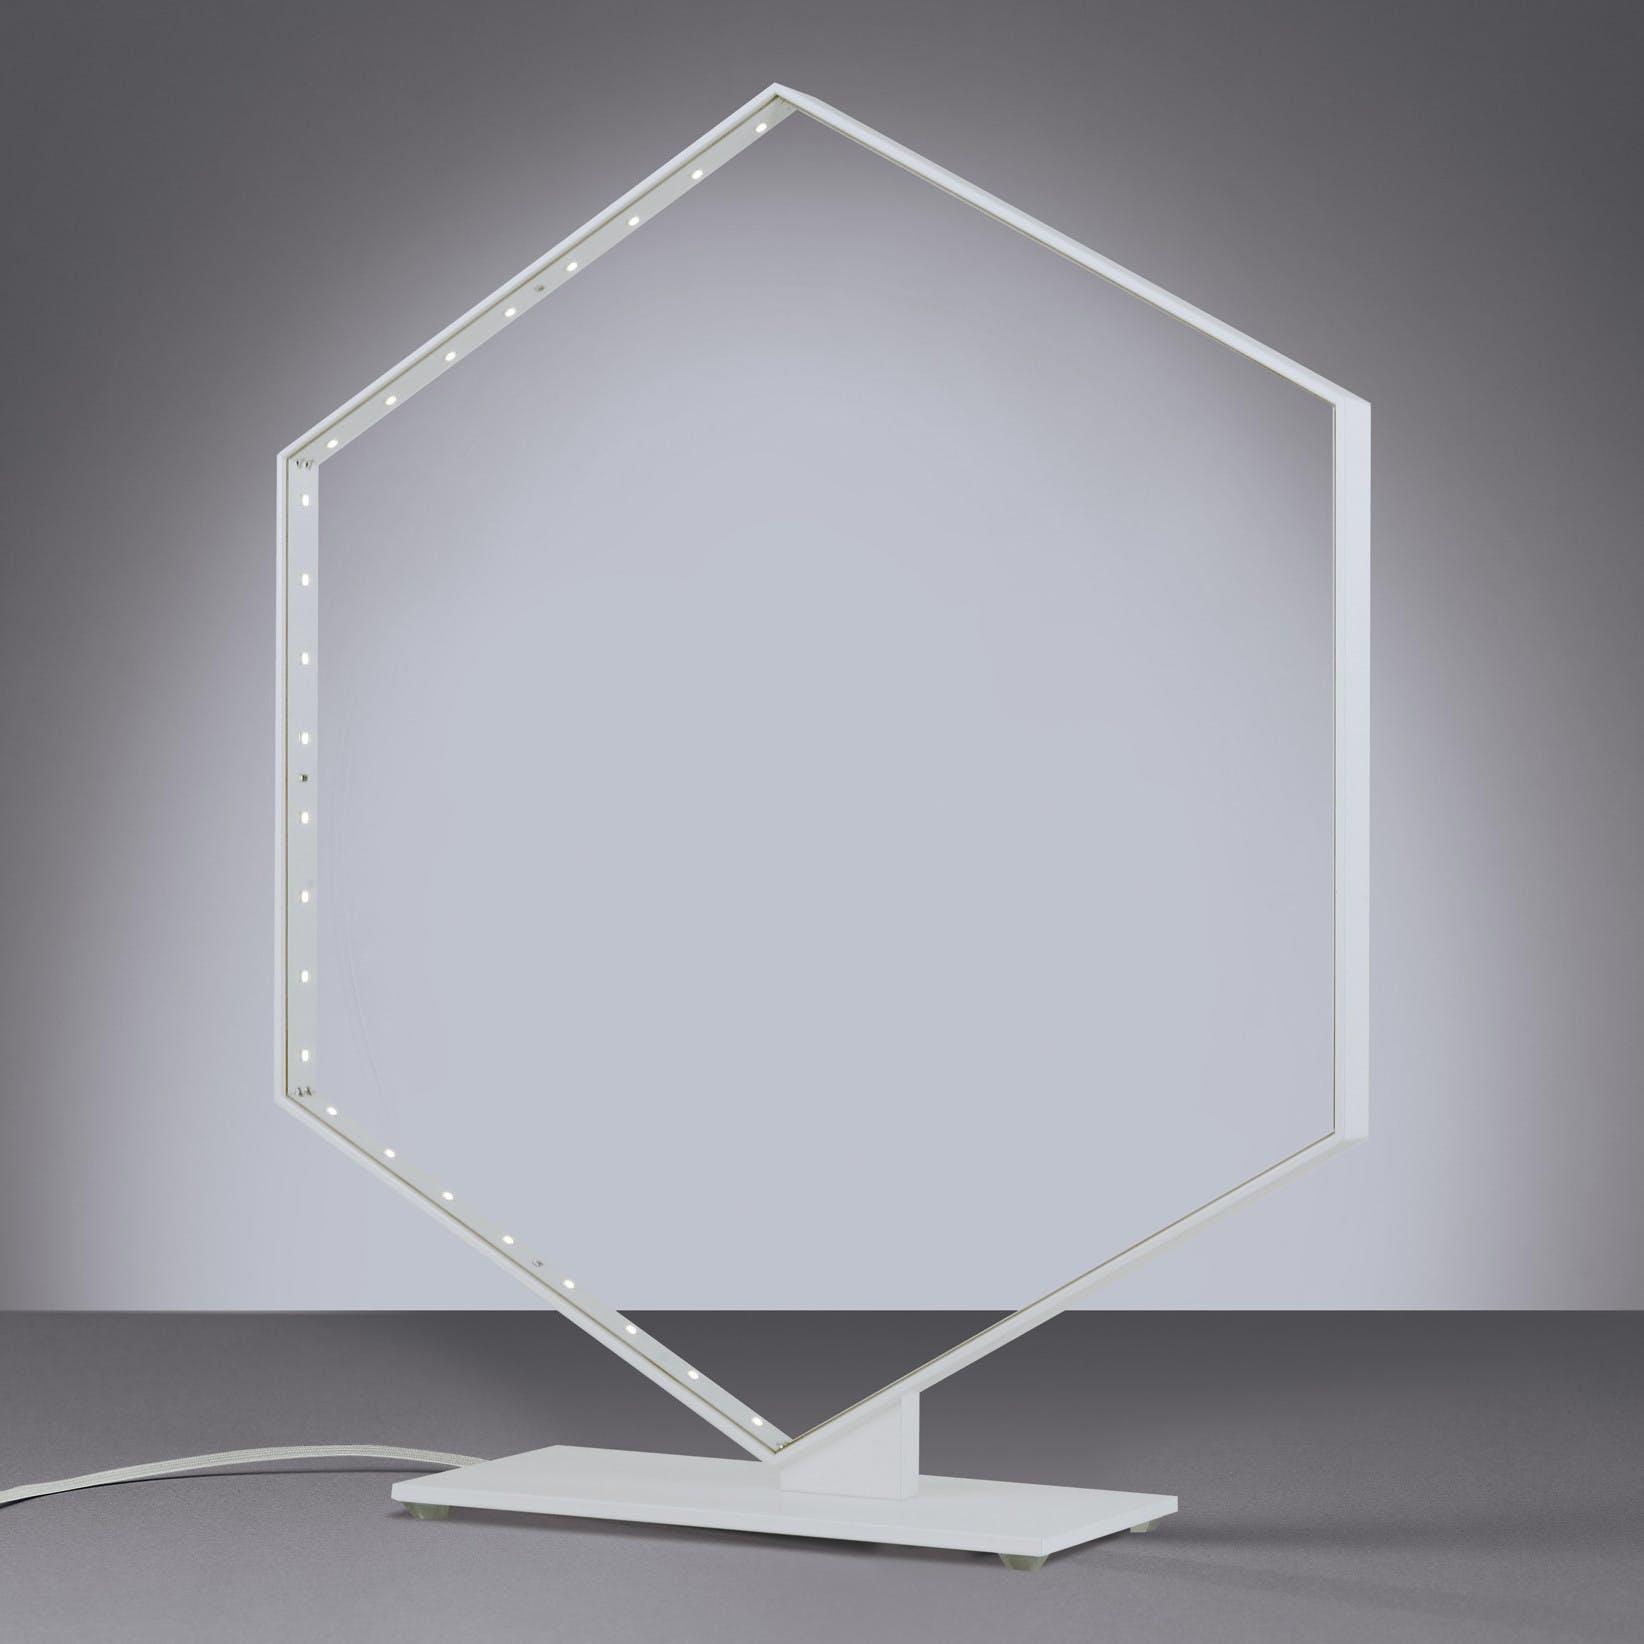 Le-deun-luminaires-hexa-table-lamp-white-haute-living_190415_220158